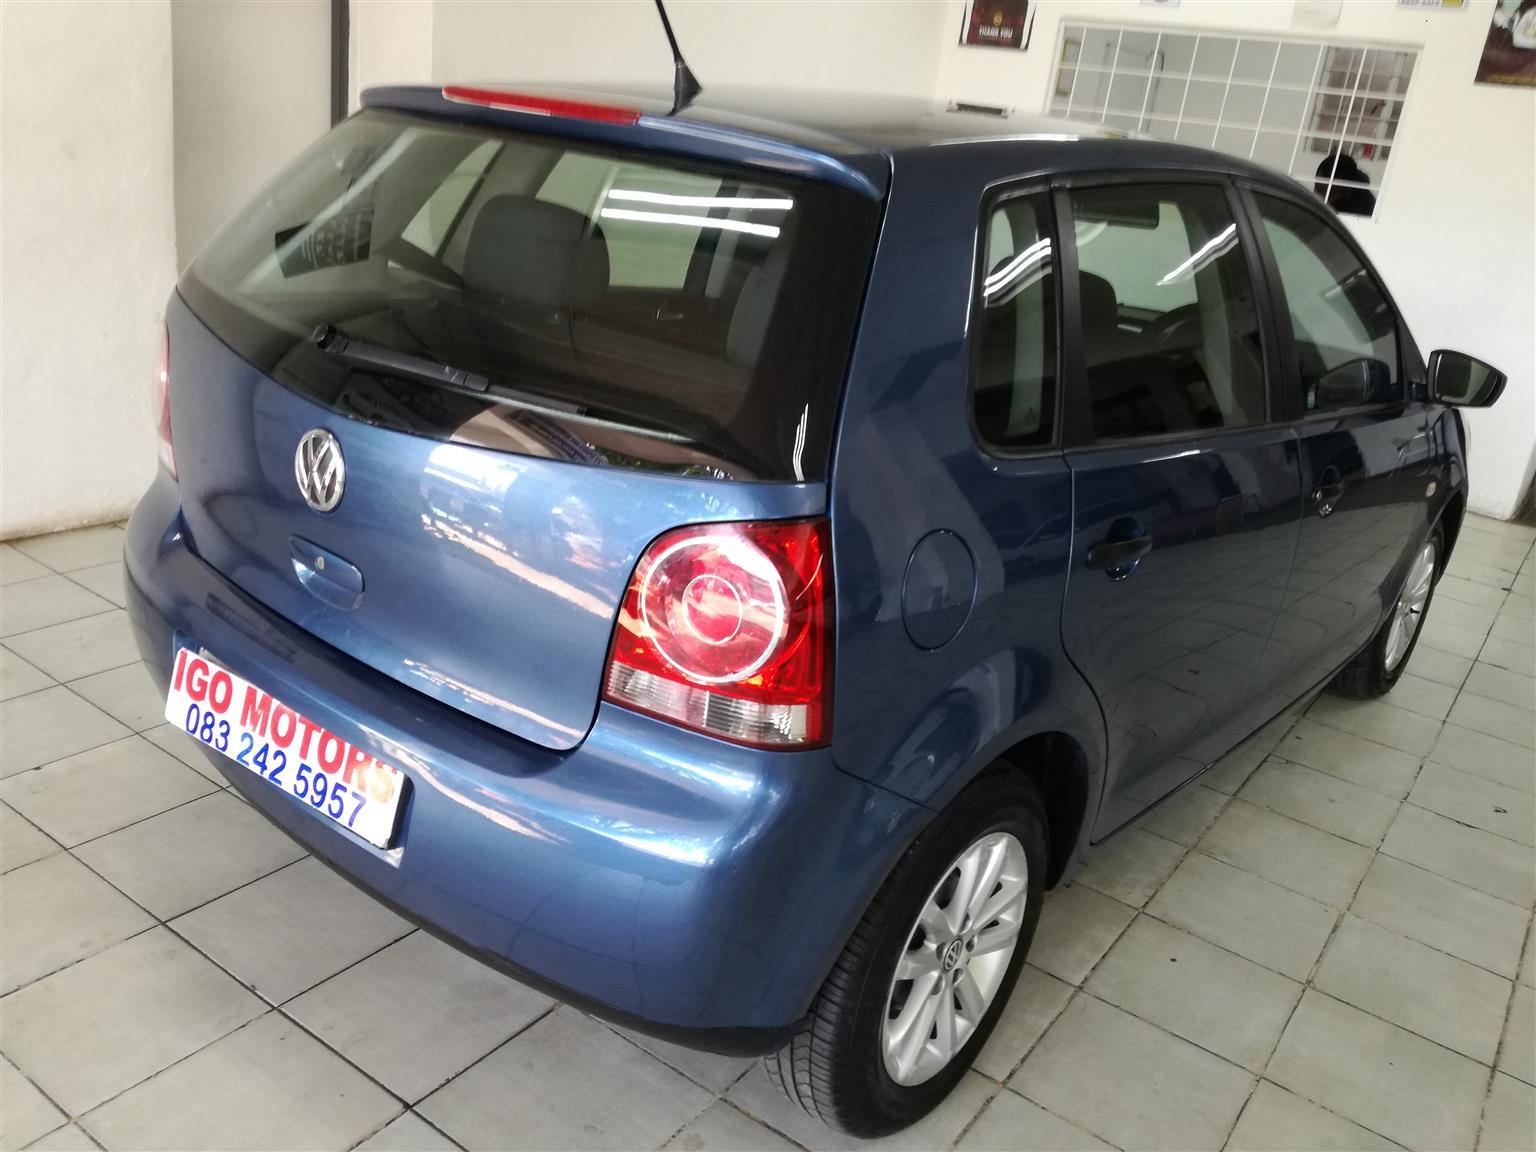 2017 Volkswagen Polo Vivo 1.4Trendline 75,000KM R85,000 Mechanically perfect